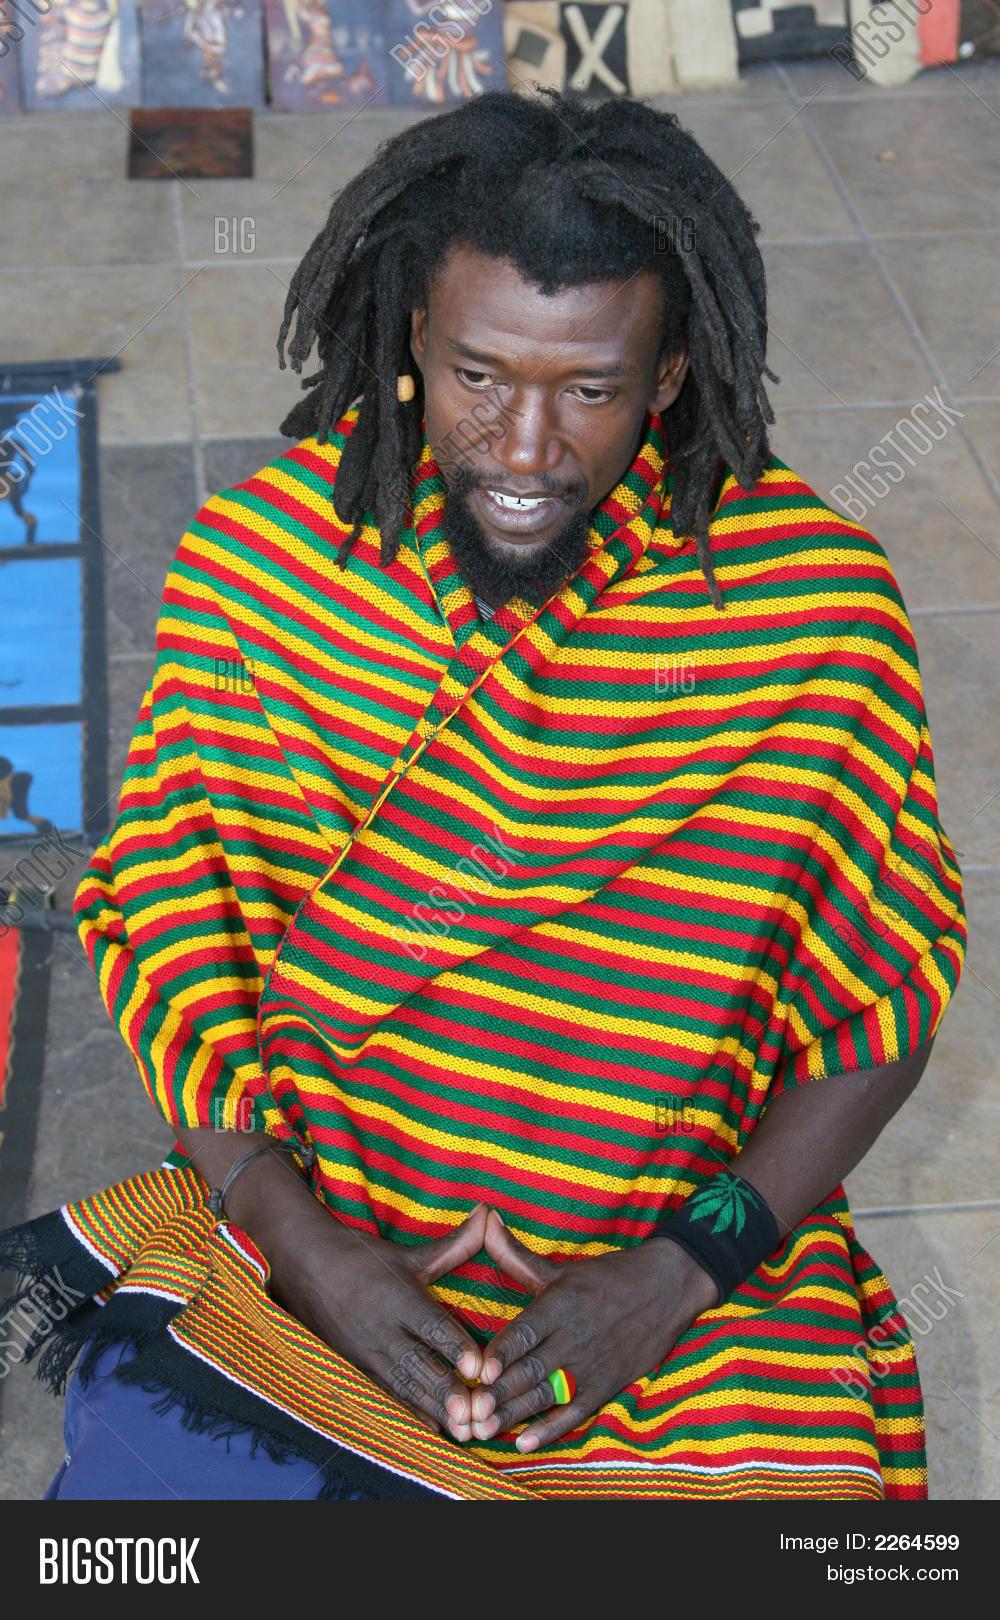 Rastafarianism | infowiki.com